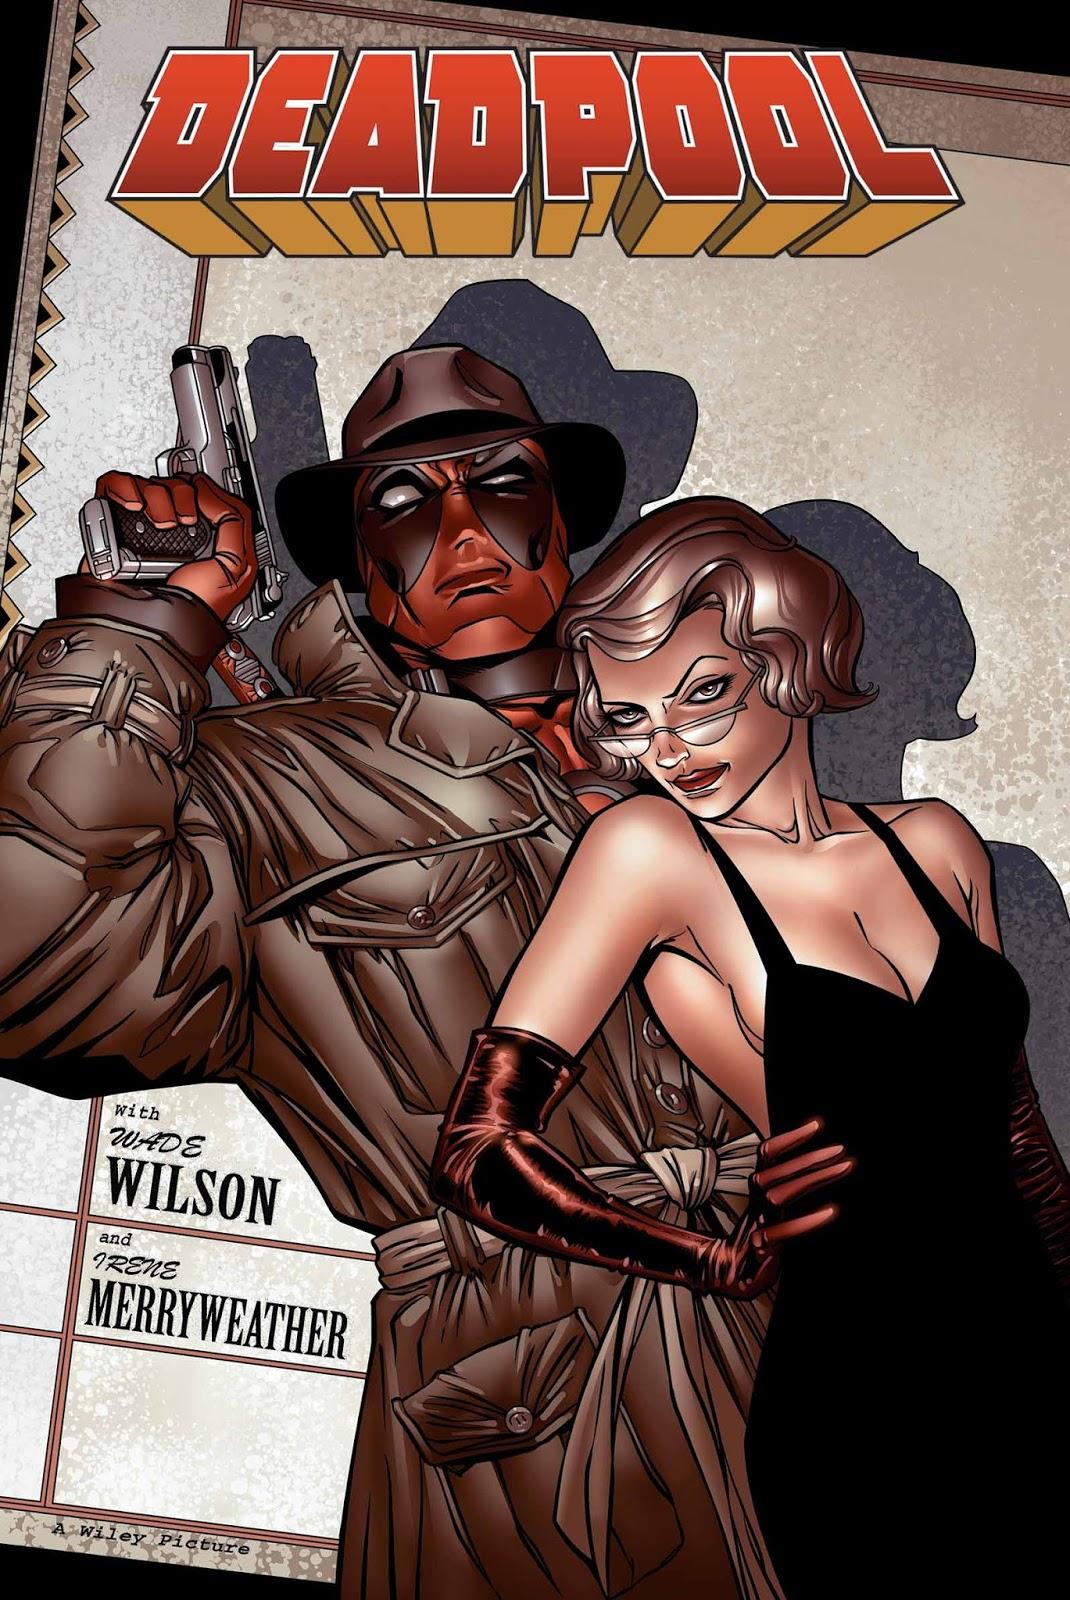 [Image: True_Believers_Detective_Deadpool_Cover.jpg]